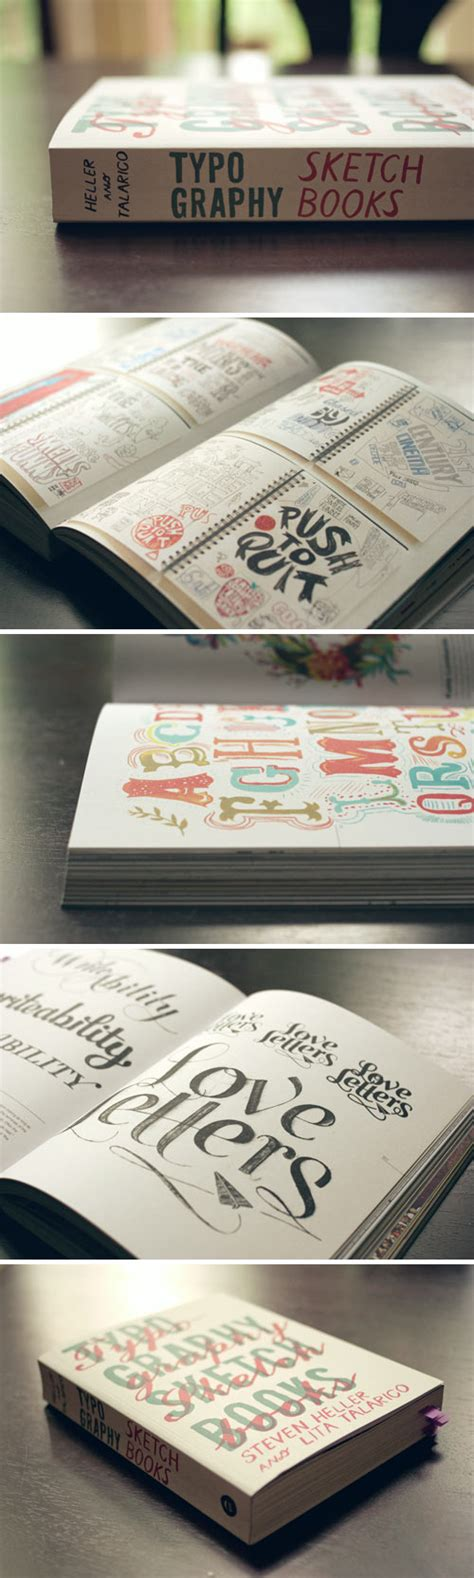 typography sketchbook typography sketchbooks wit whistle